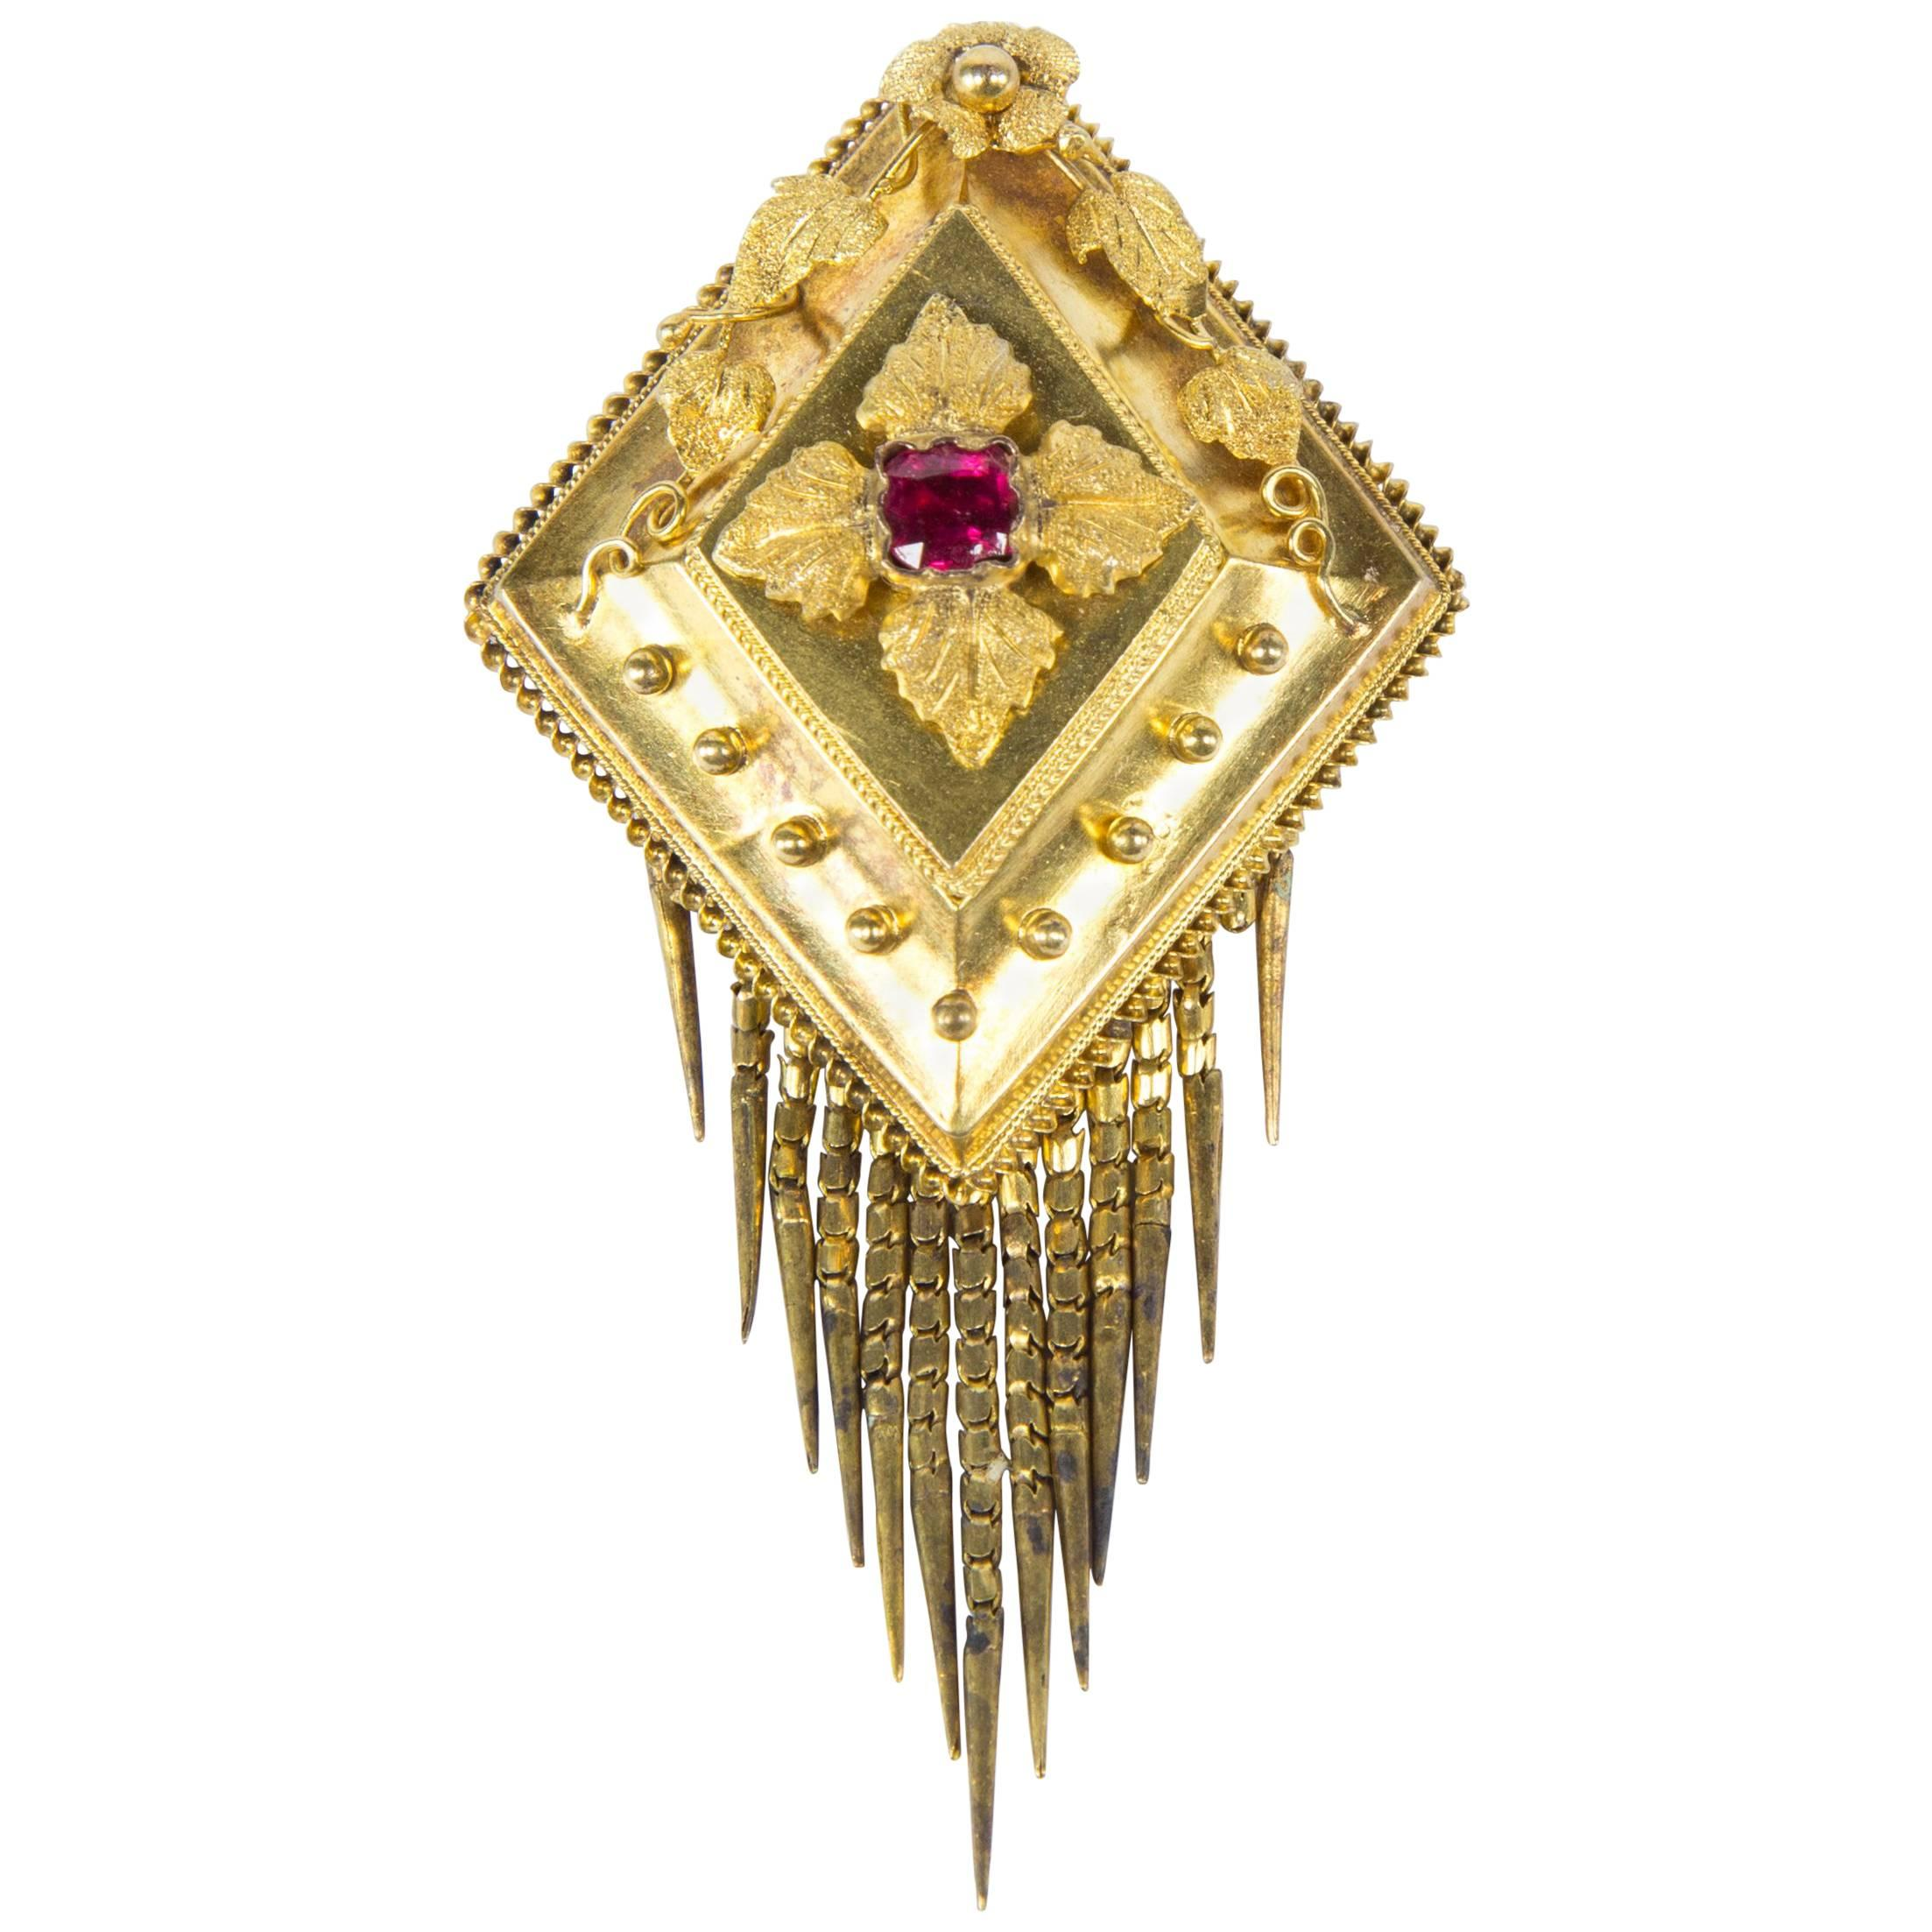 Antique Victorian Gold Mourning Tassel Brooch Pin Locket Estate Fine Jewelry